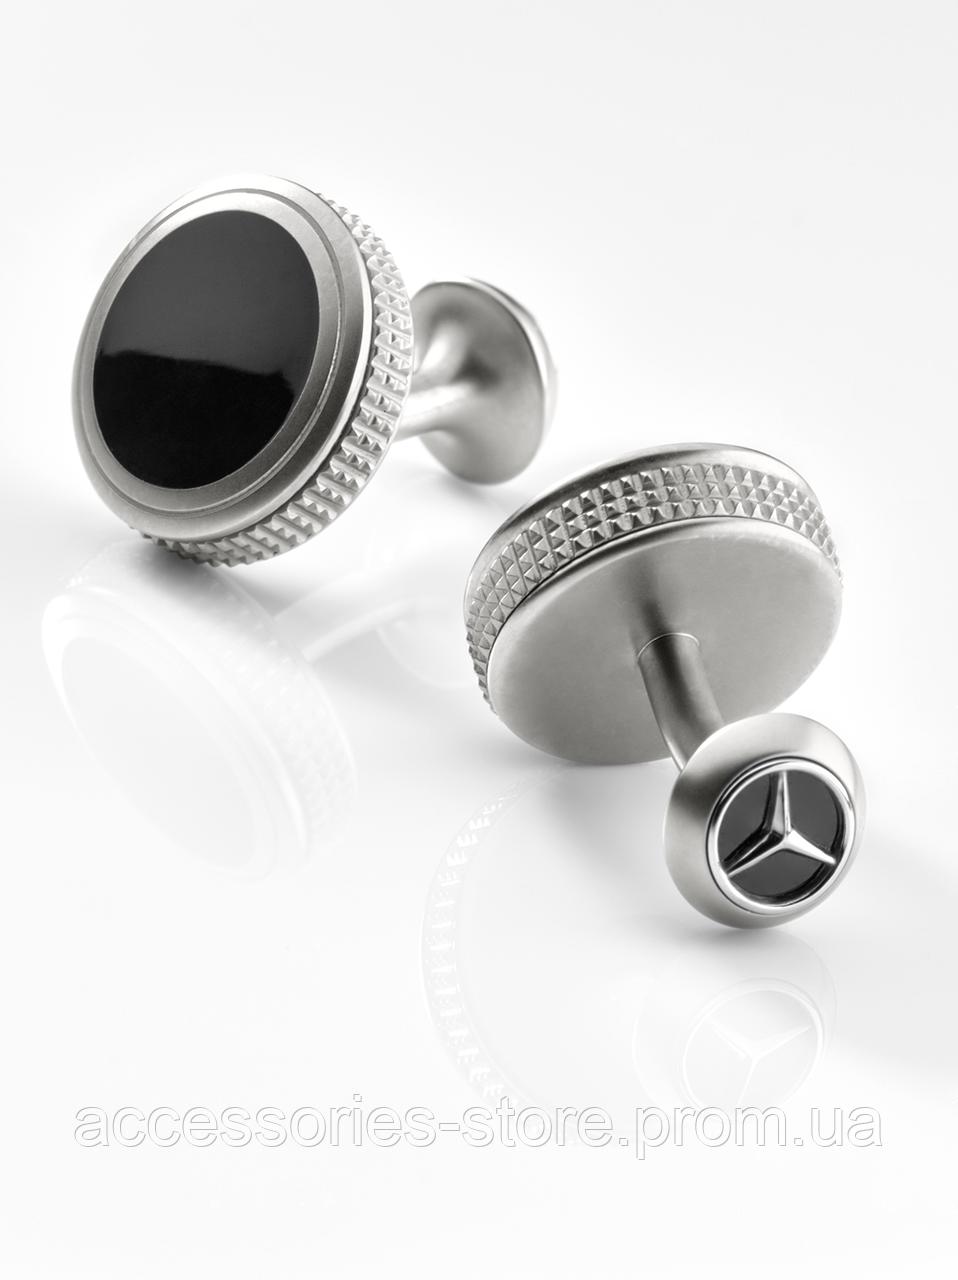 Запонки Mercedes-Benz Cufflinks, Silver / Black